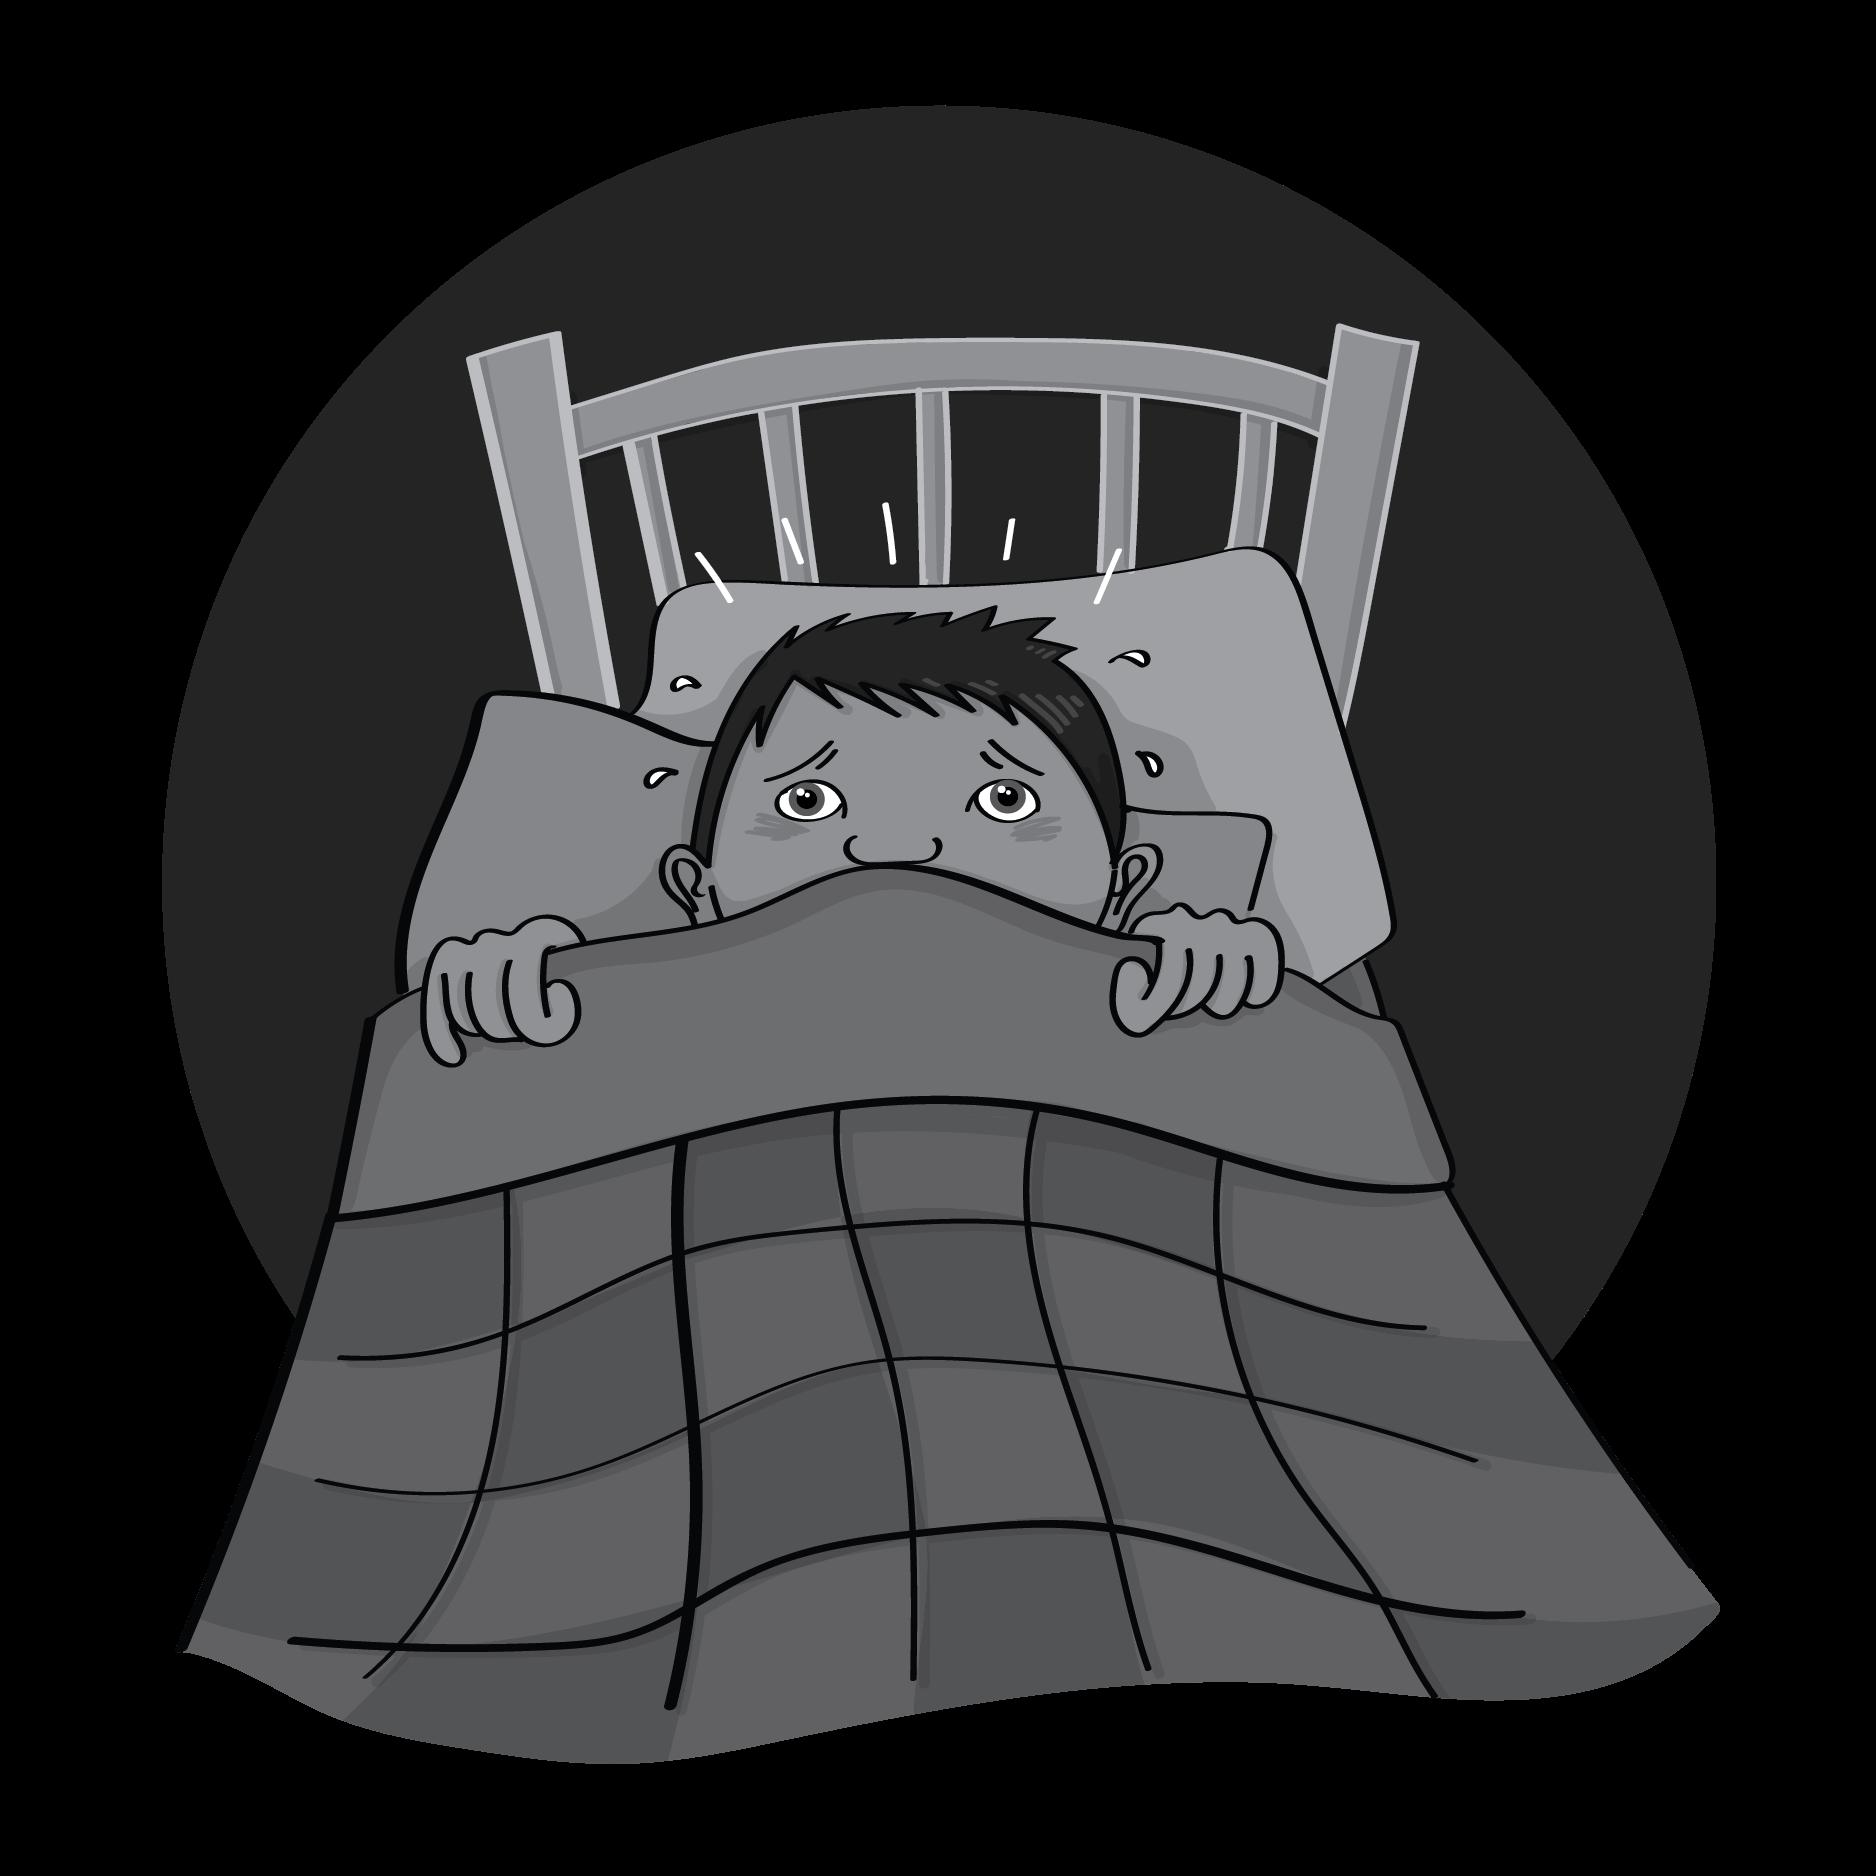 Noah having a bad dream